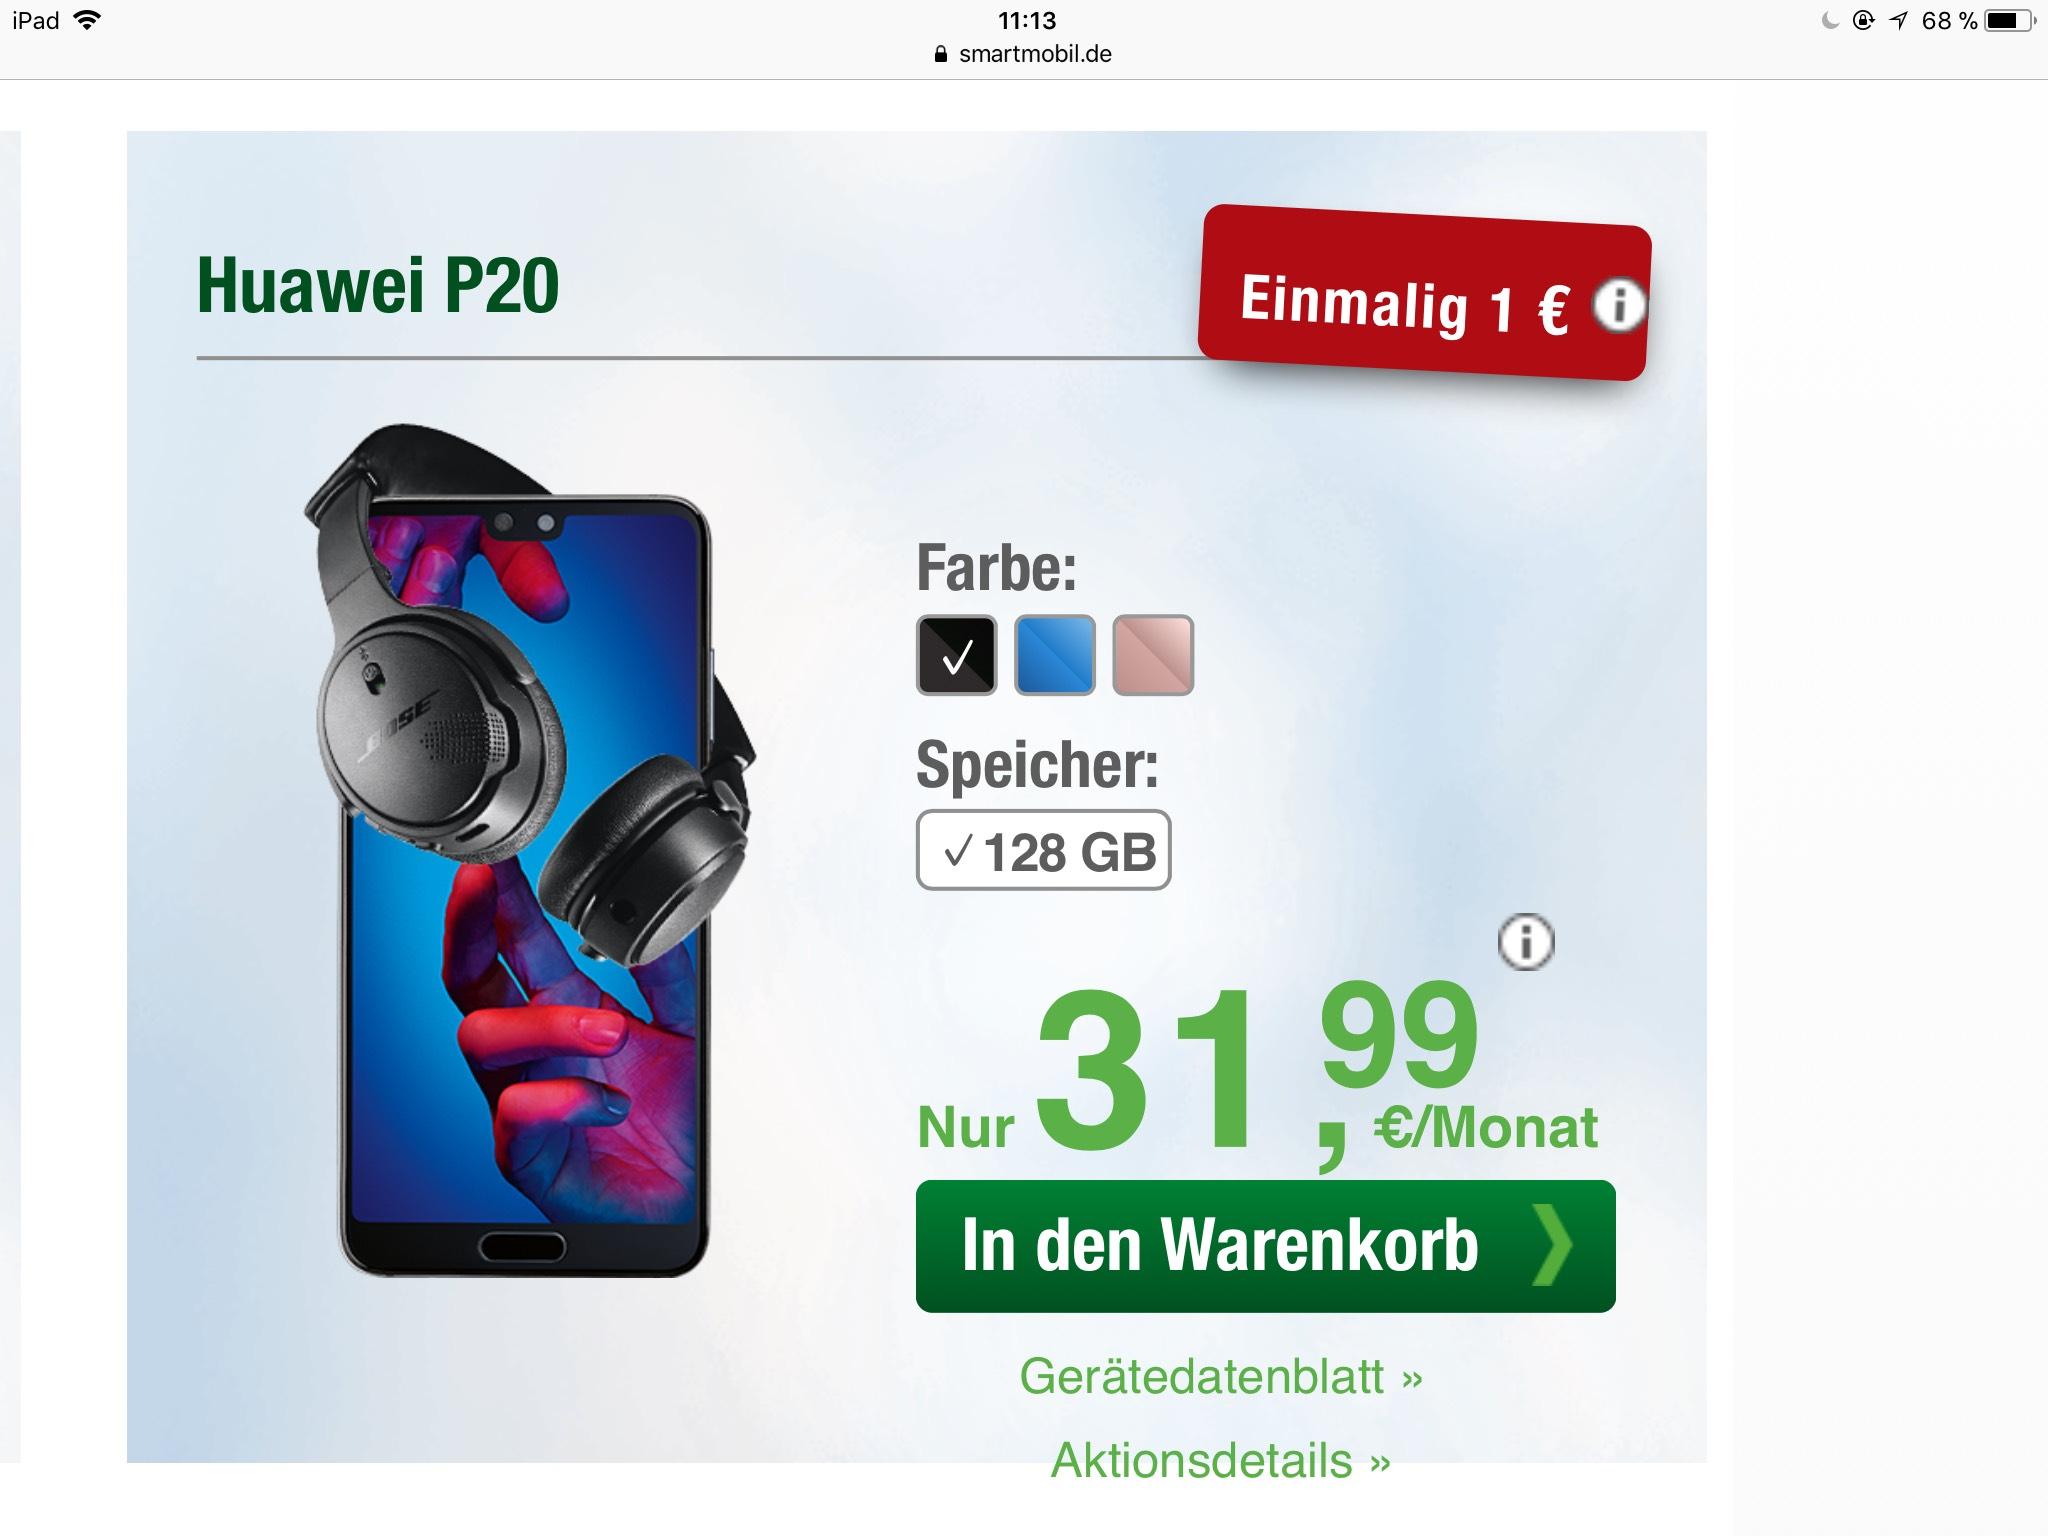 [smartmobile] Huawei p20 im o2 Netz  für 31,99€ mtl. (5 GB LTE, Allnet- & sms Flat)